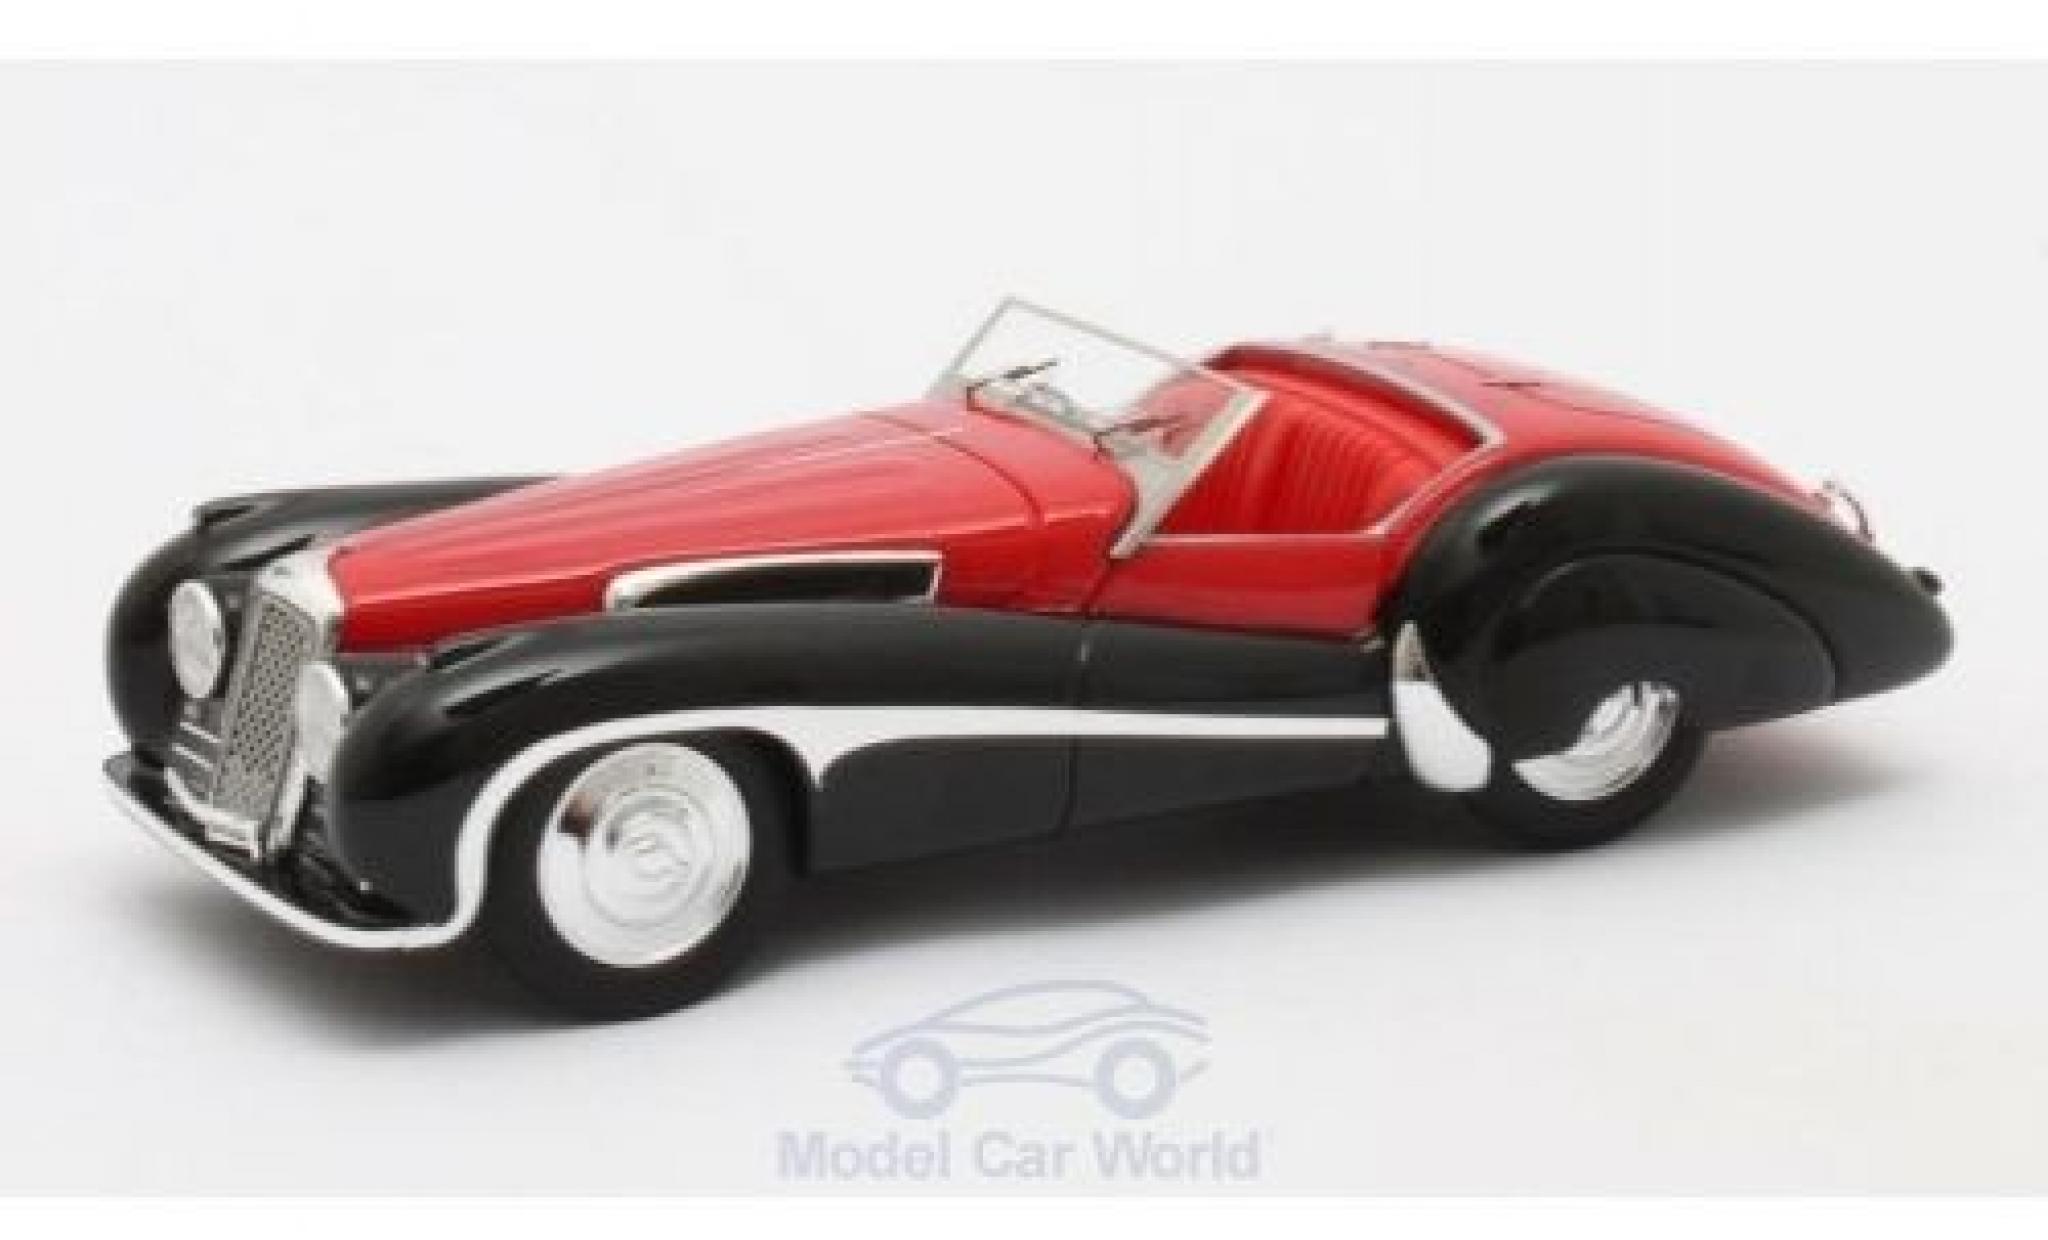 Jaguar SS 1/43 Matrix 100 red/black 1939 Roadster Vanden Plas